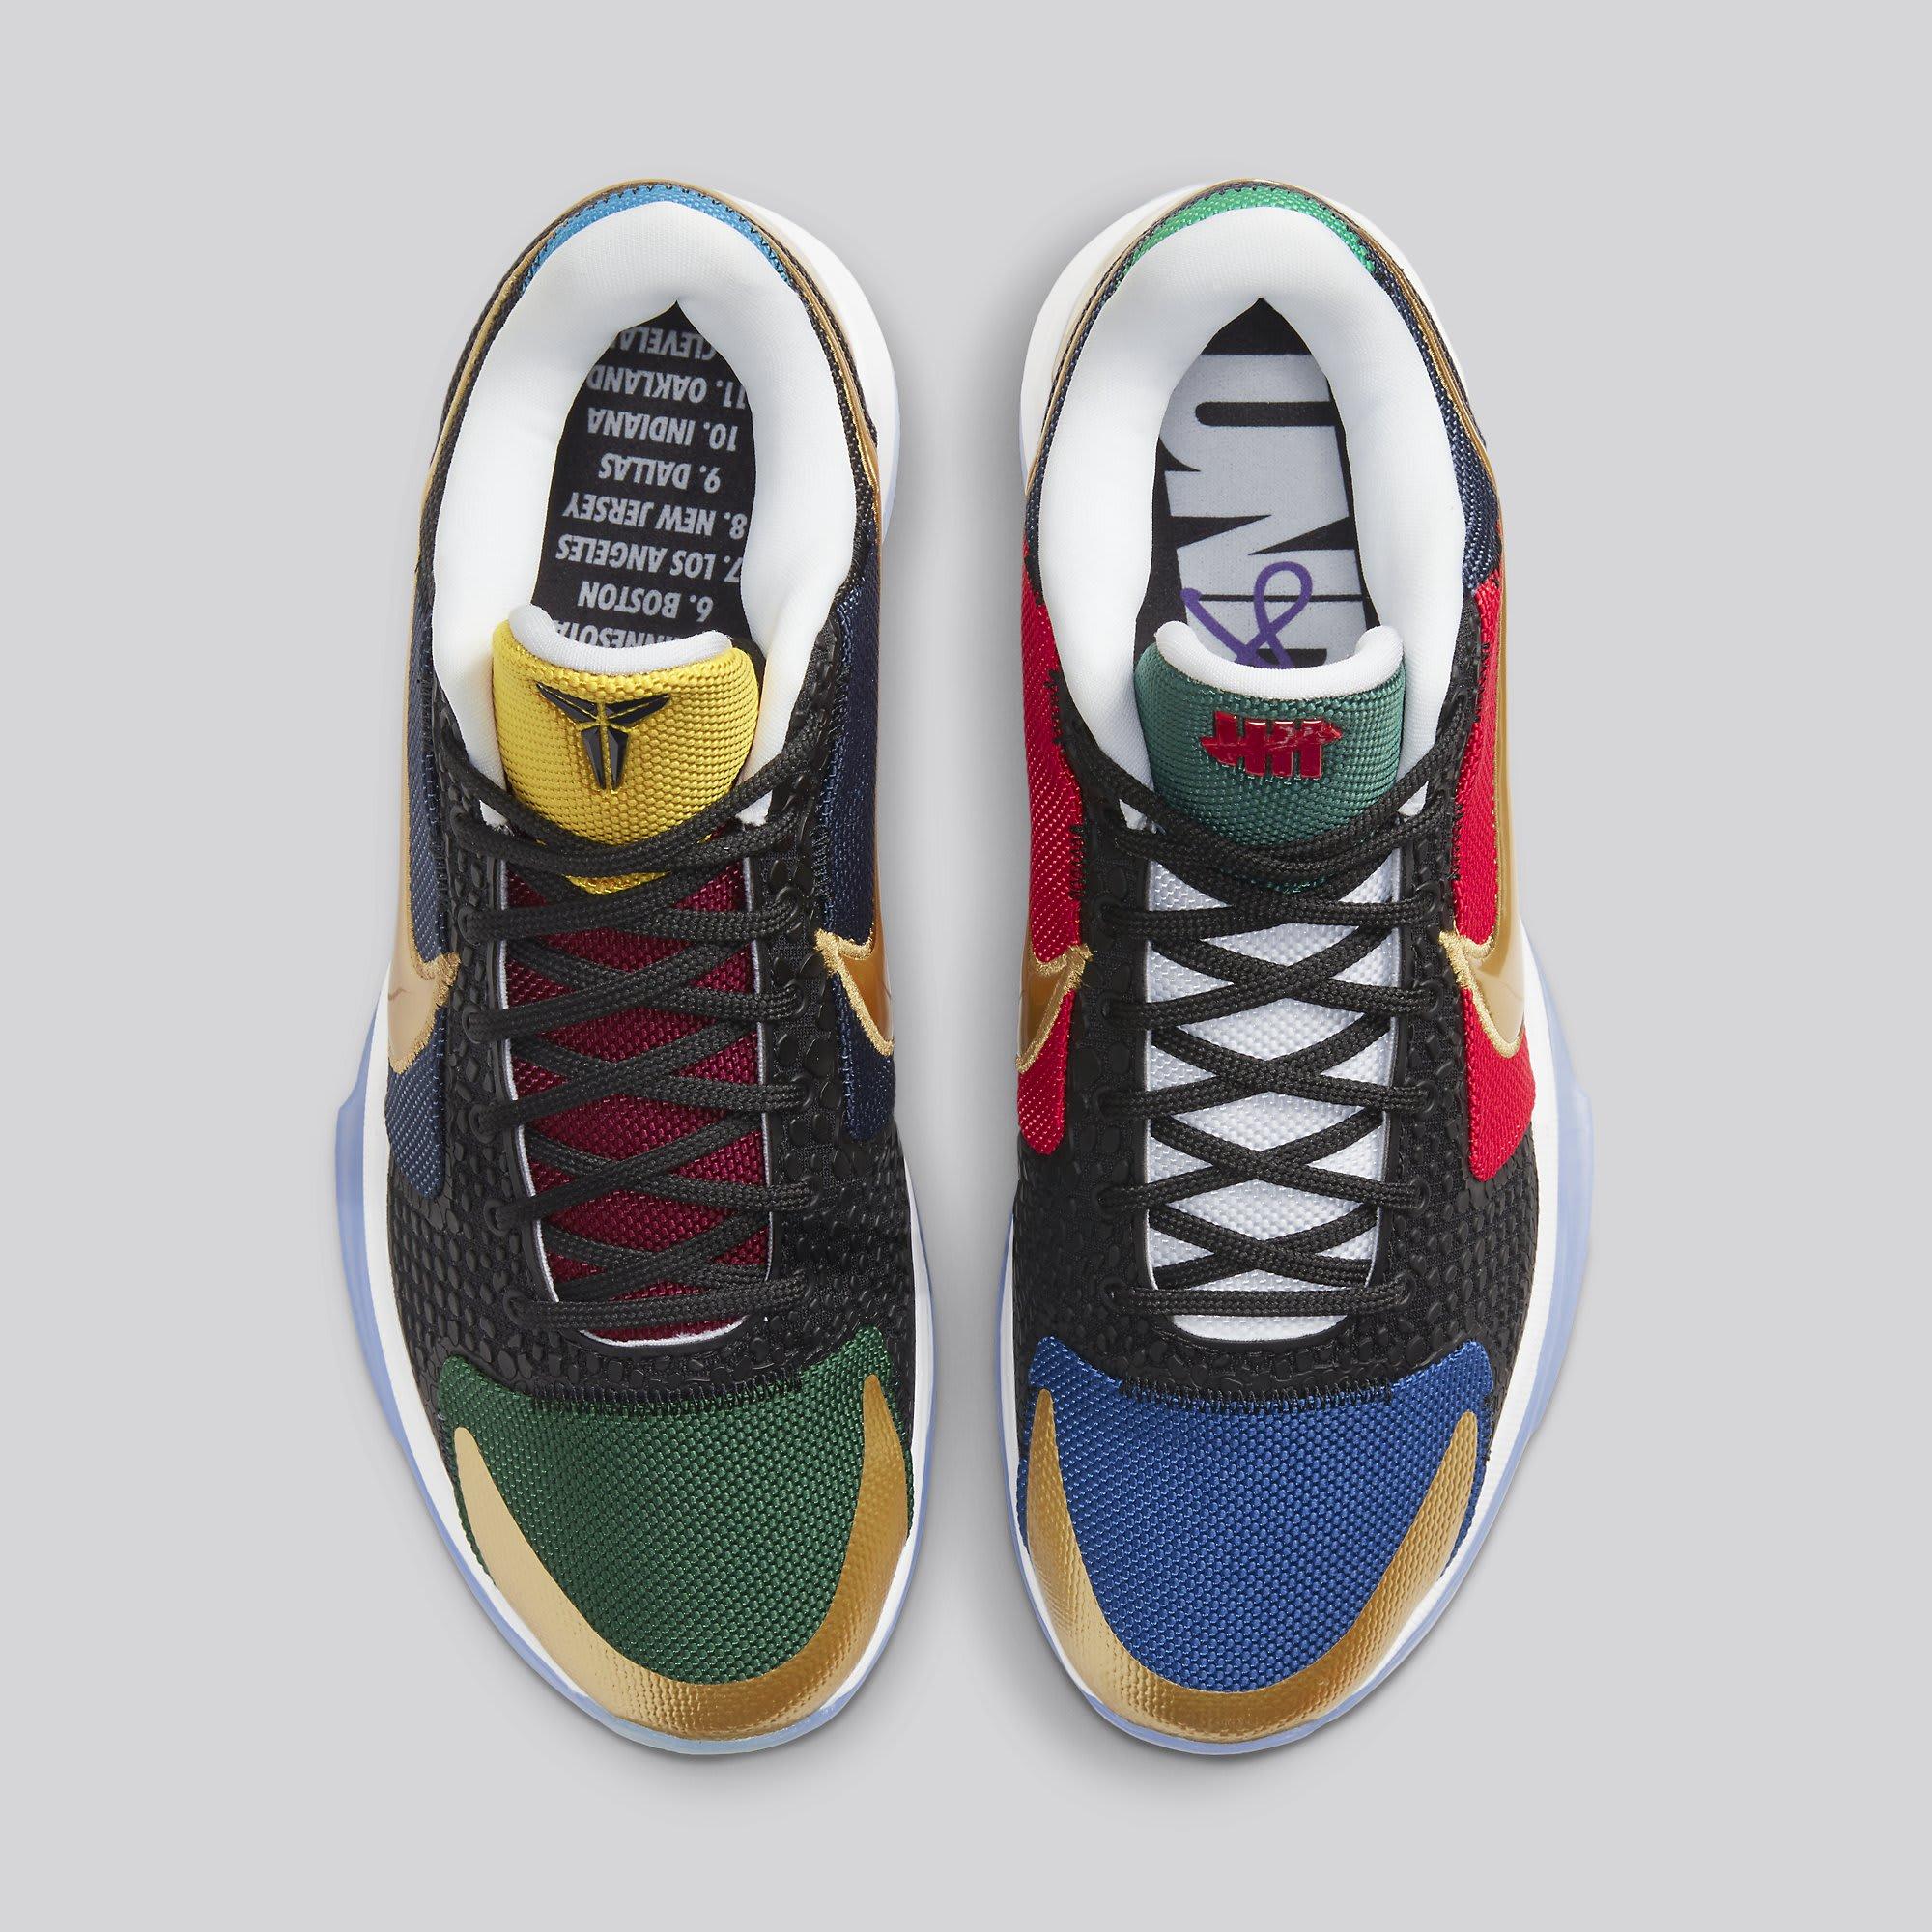 Undefeated x Nike Kobe 5 Protro 'Dirty Dozen' DB5551-900 Top